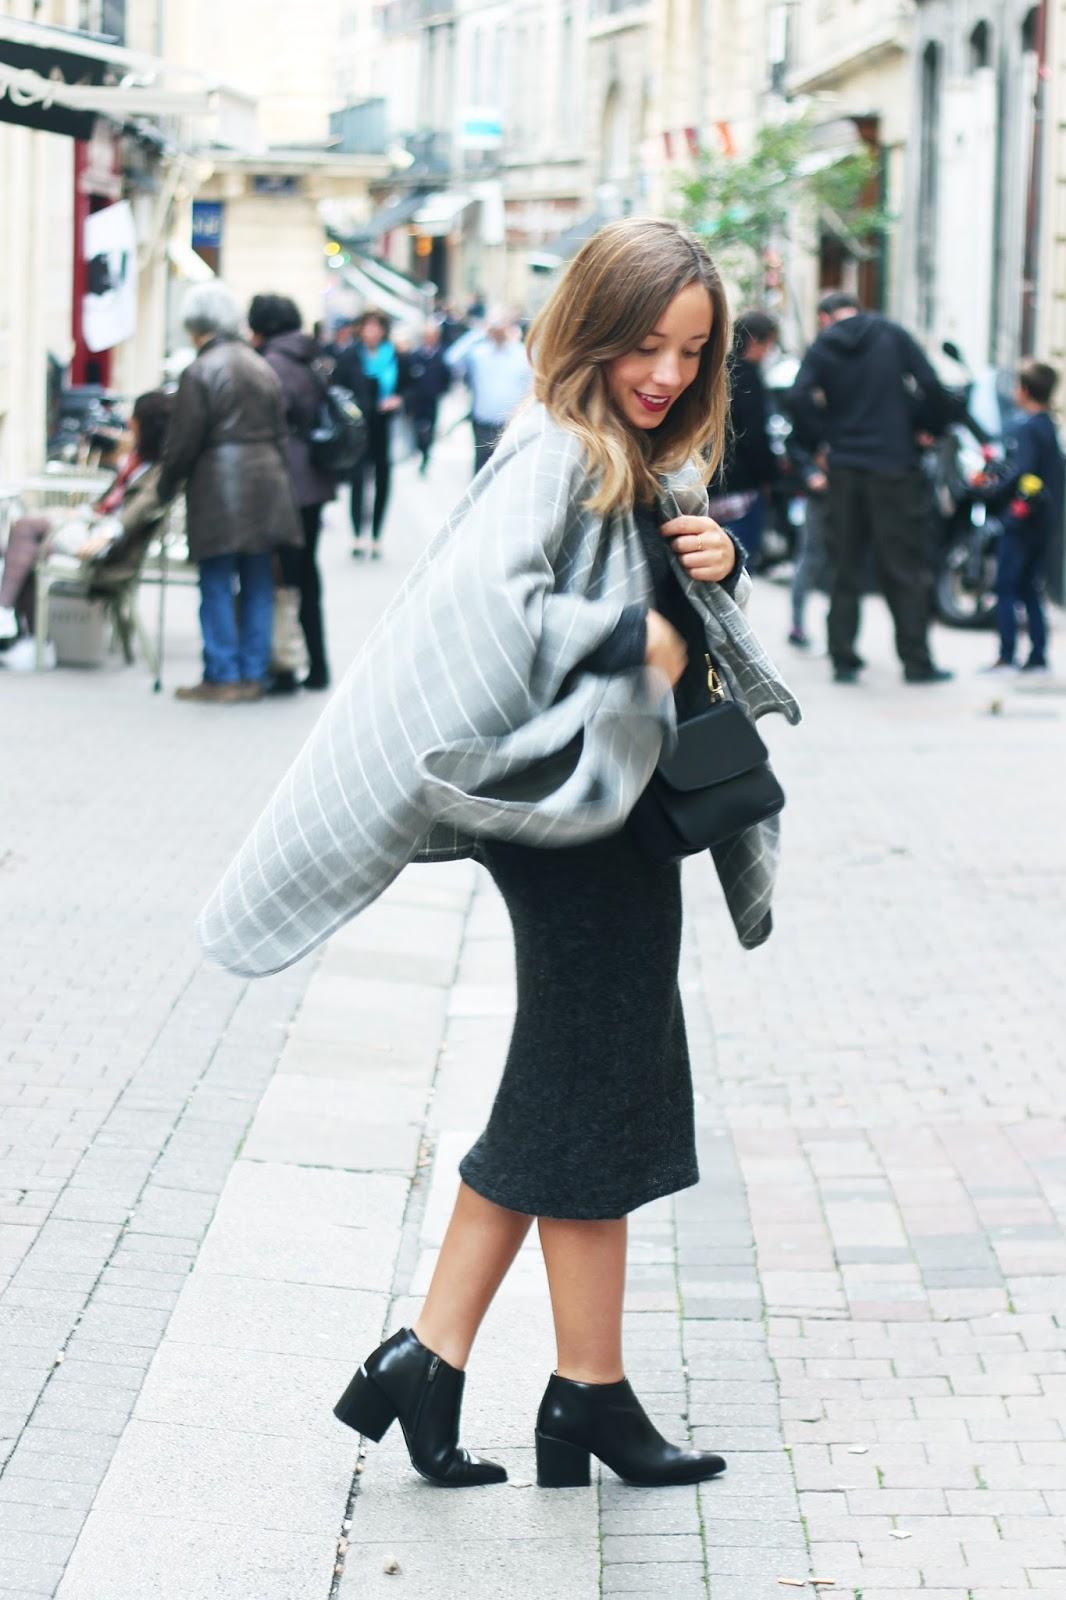 robe longue petite taille blog mode la penderie de chloe. Black Bedroom Furniture Sets. Home Design Ideas